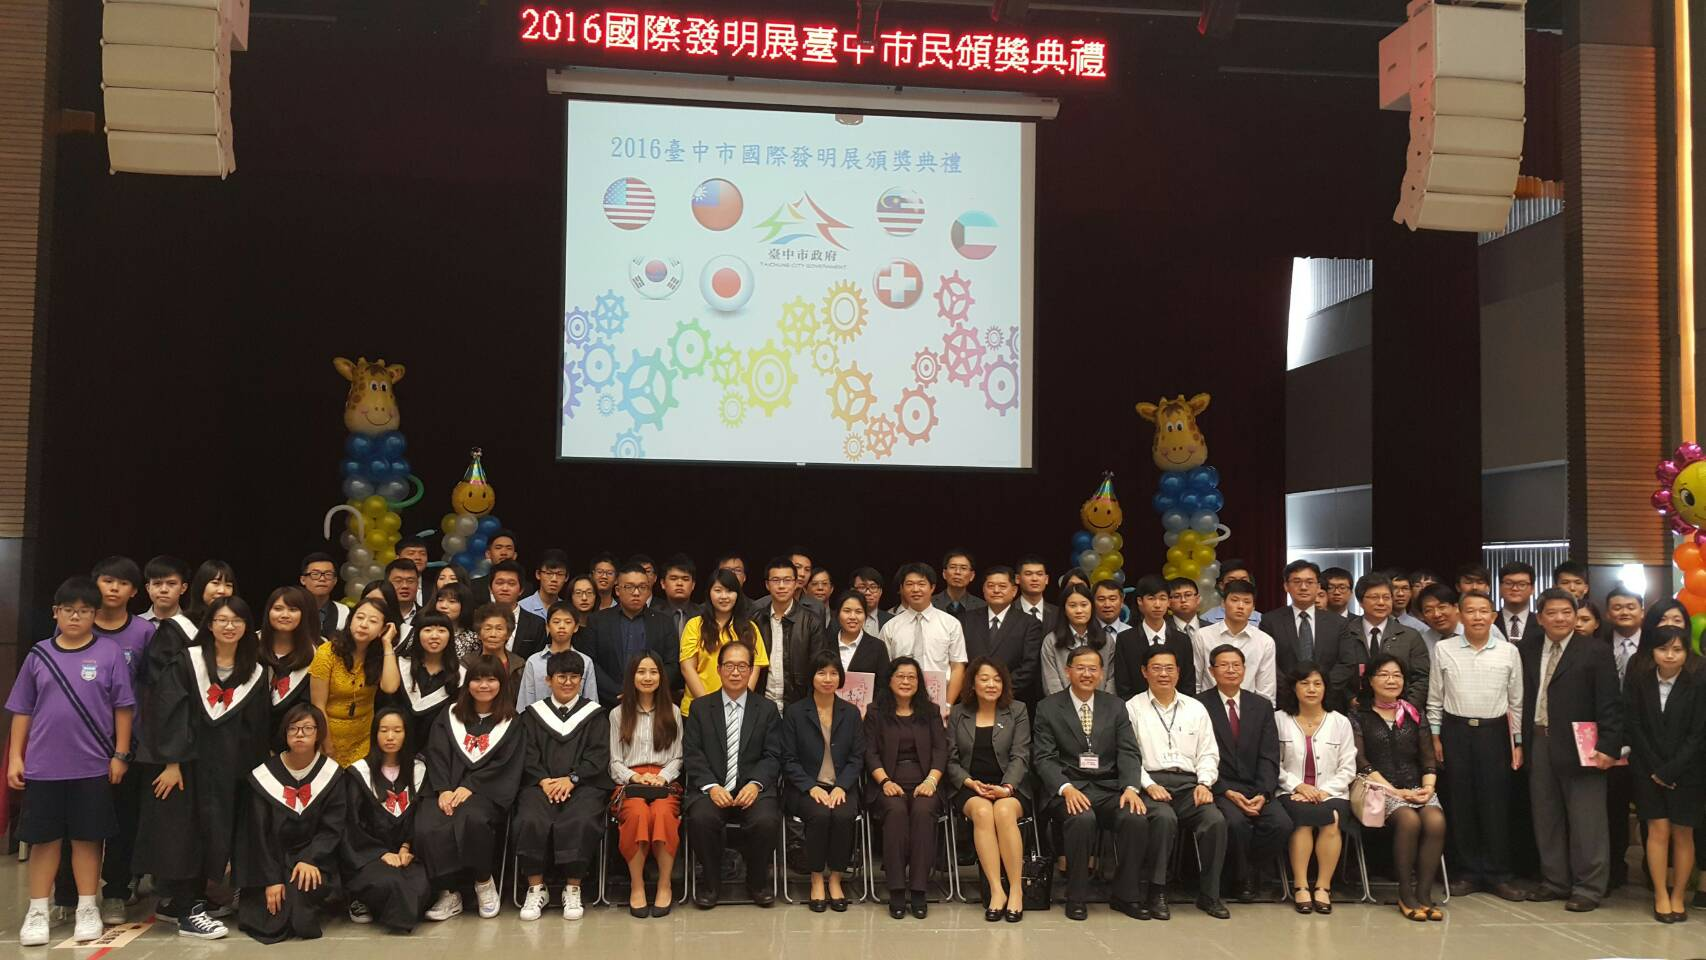 2016 Taichung City International Development Award Ceremony